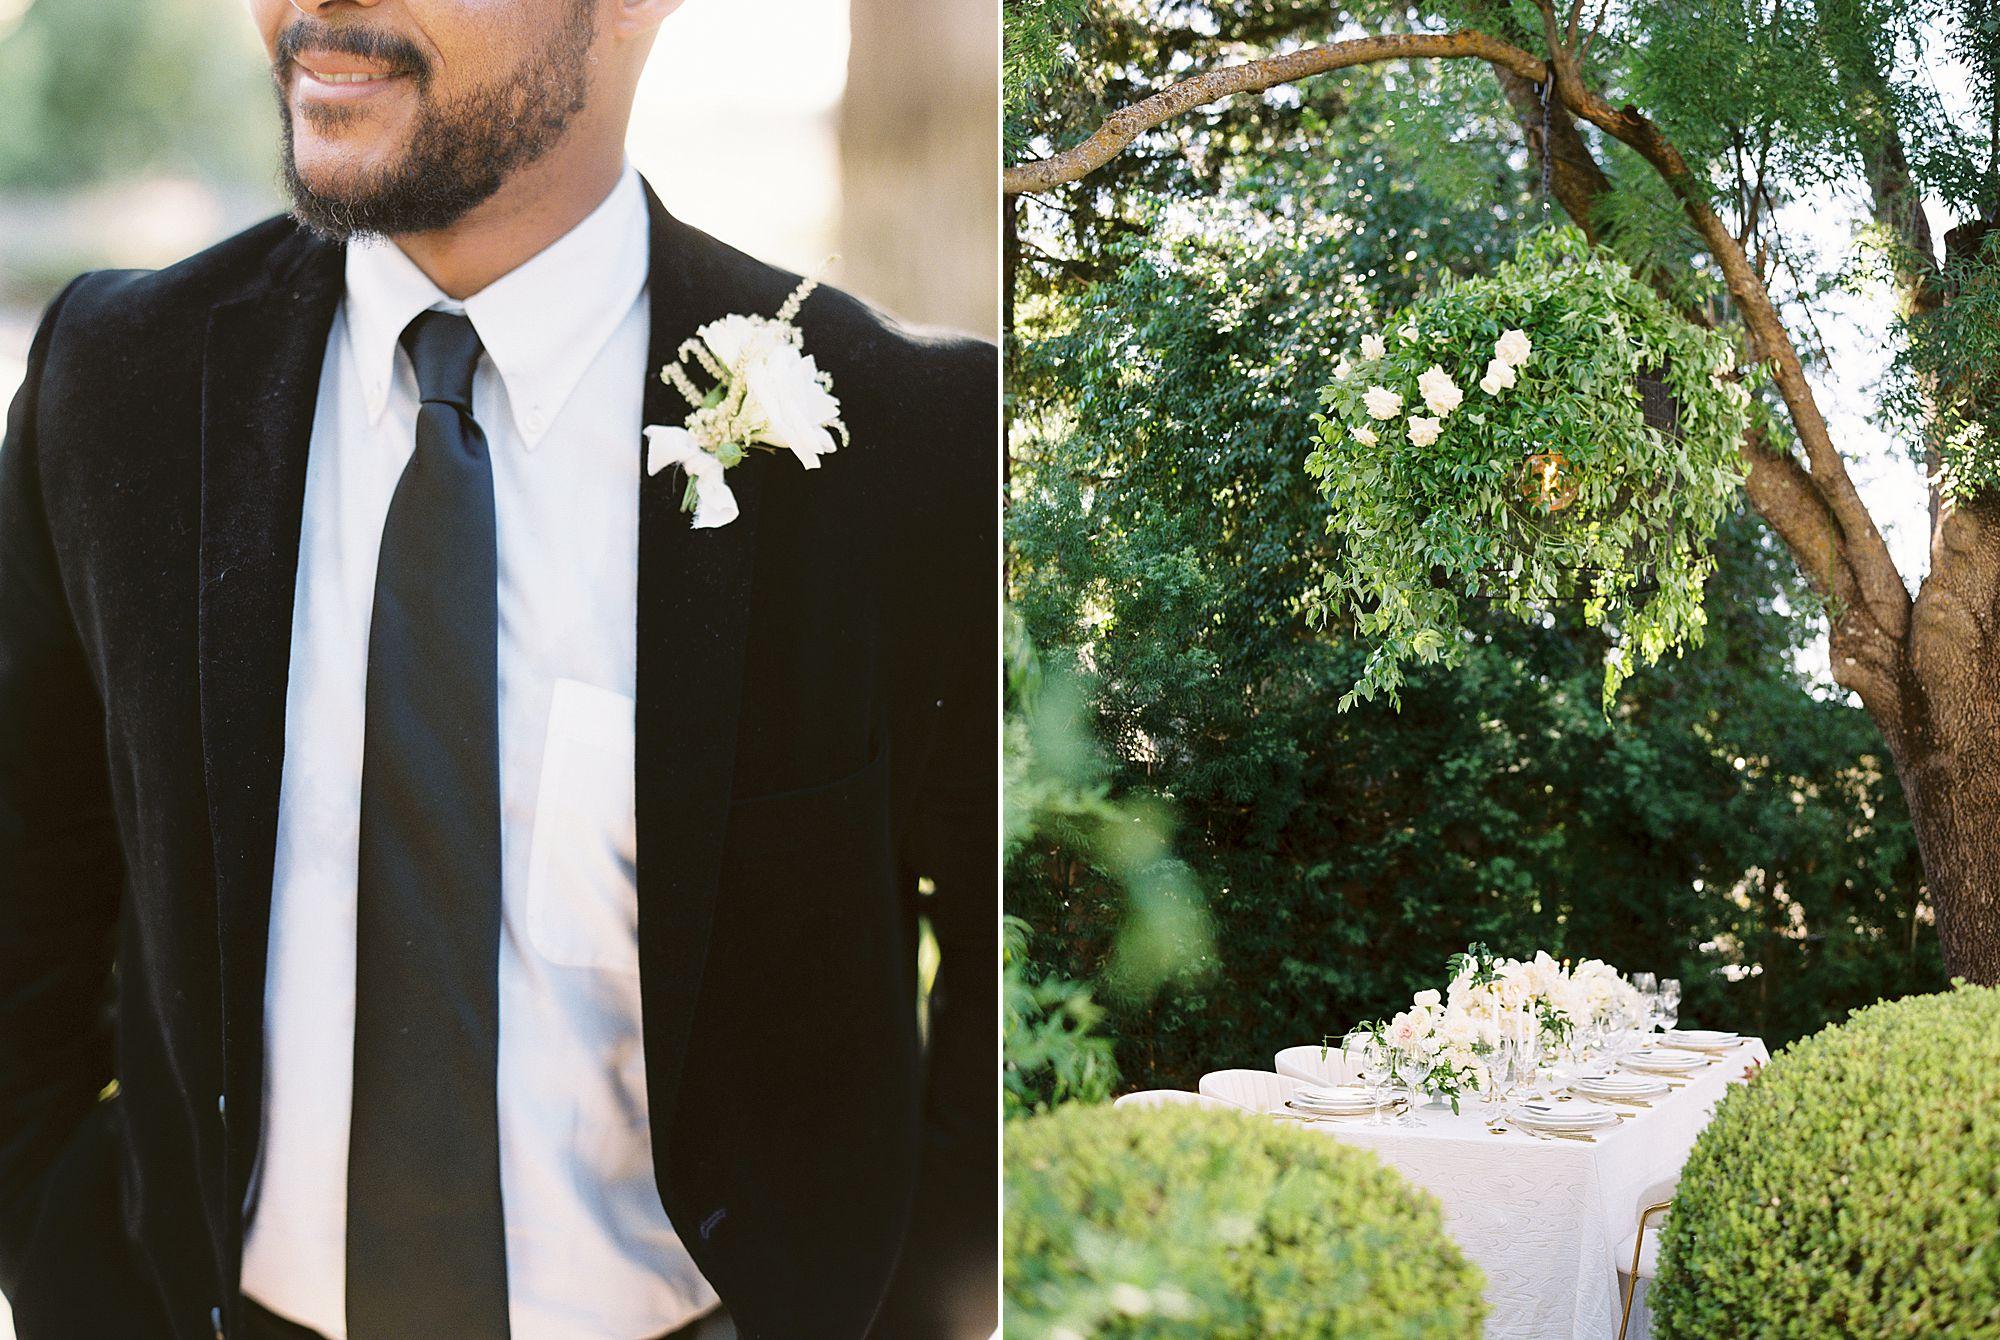 Park Winters Micro-Wedding Inspiration on Style Me Pretty - Stephanie Teague Events - Ashley Baumgartner - Park Winters Wedding - Black Tie Wedding - Micro-Wedding Sacramento Photographer_0017.jpg